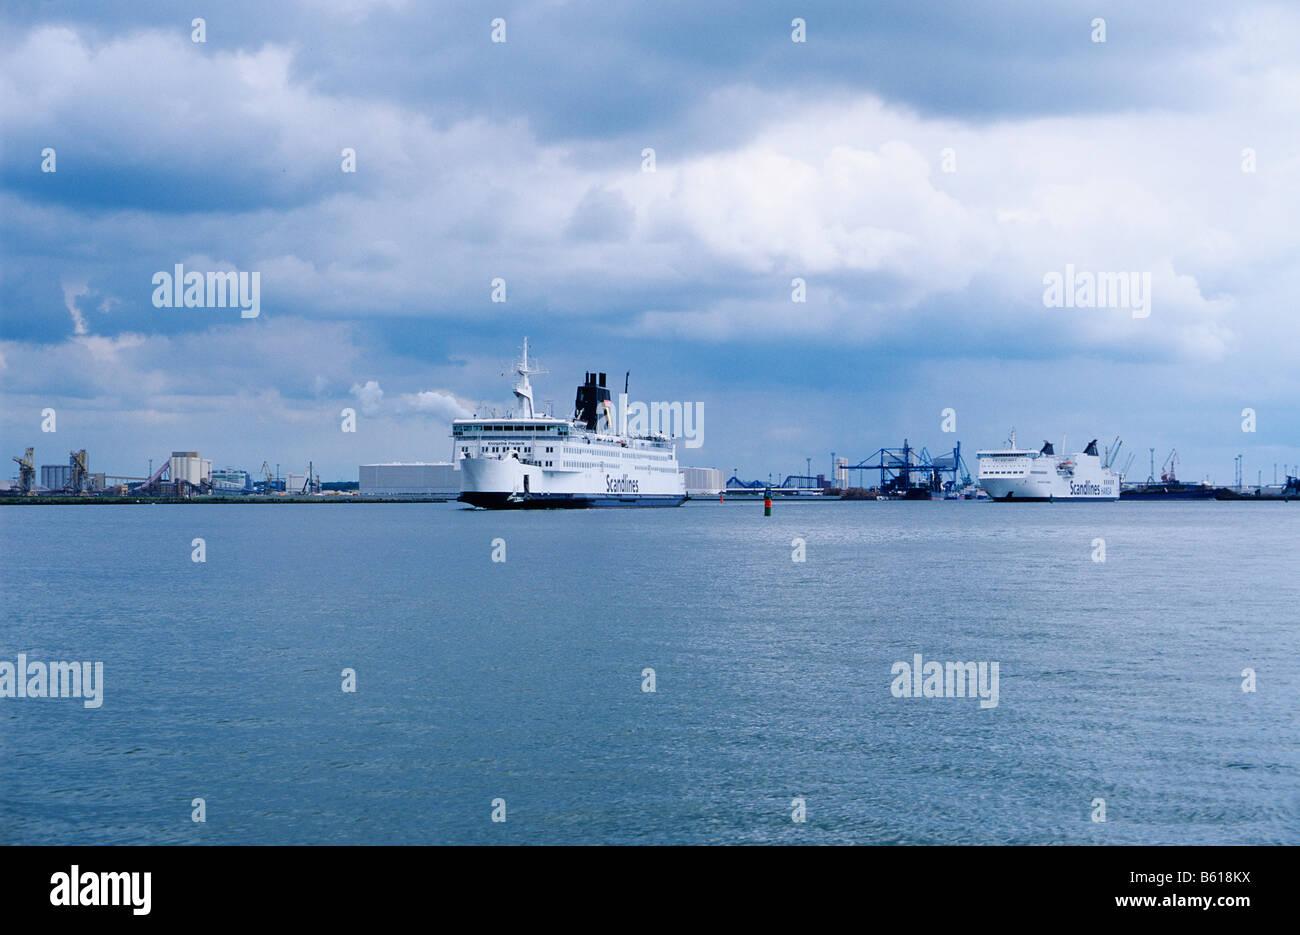 Scandlines ferries in a Baltic Sea port, Mecklenburg-Western Pomerania - Stock Image